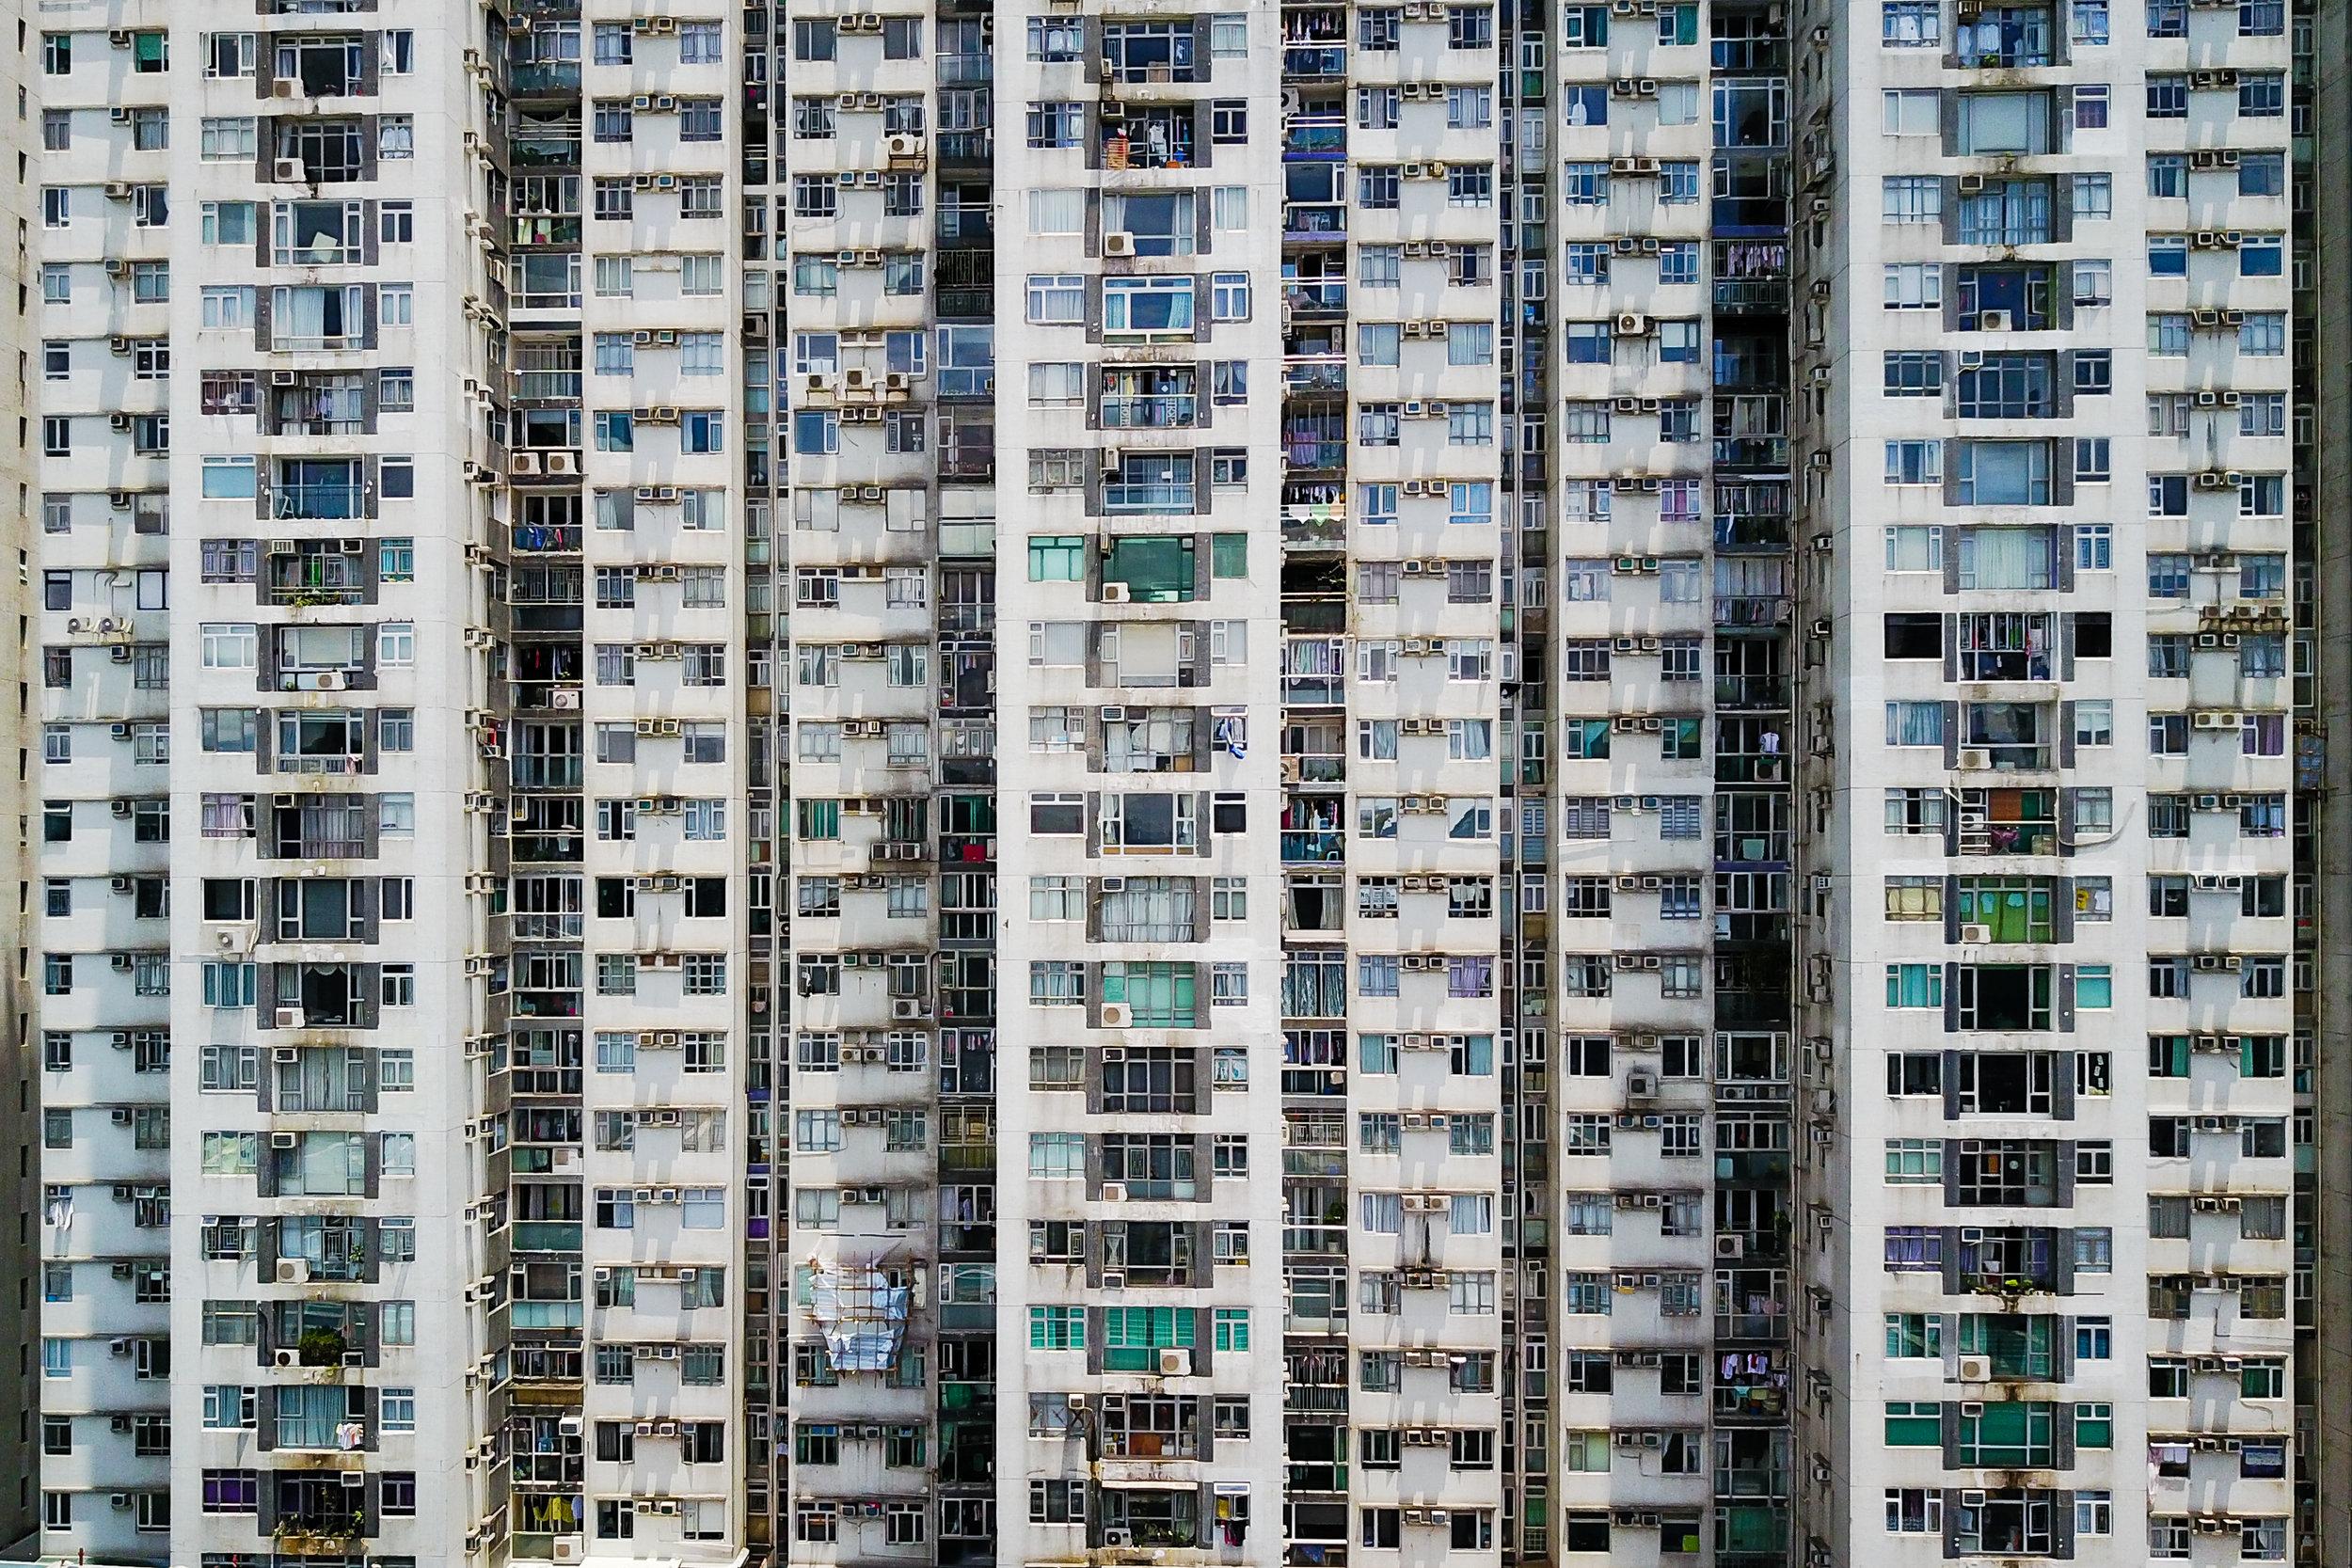 Apartment building, Hong Kong